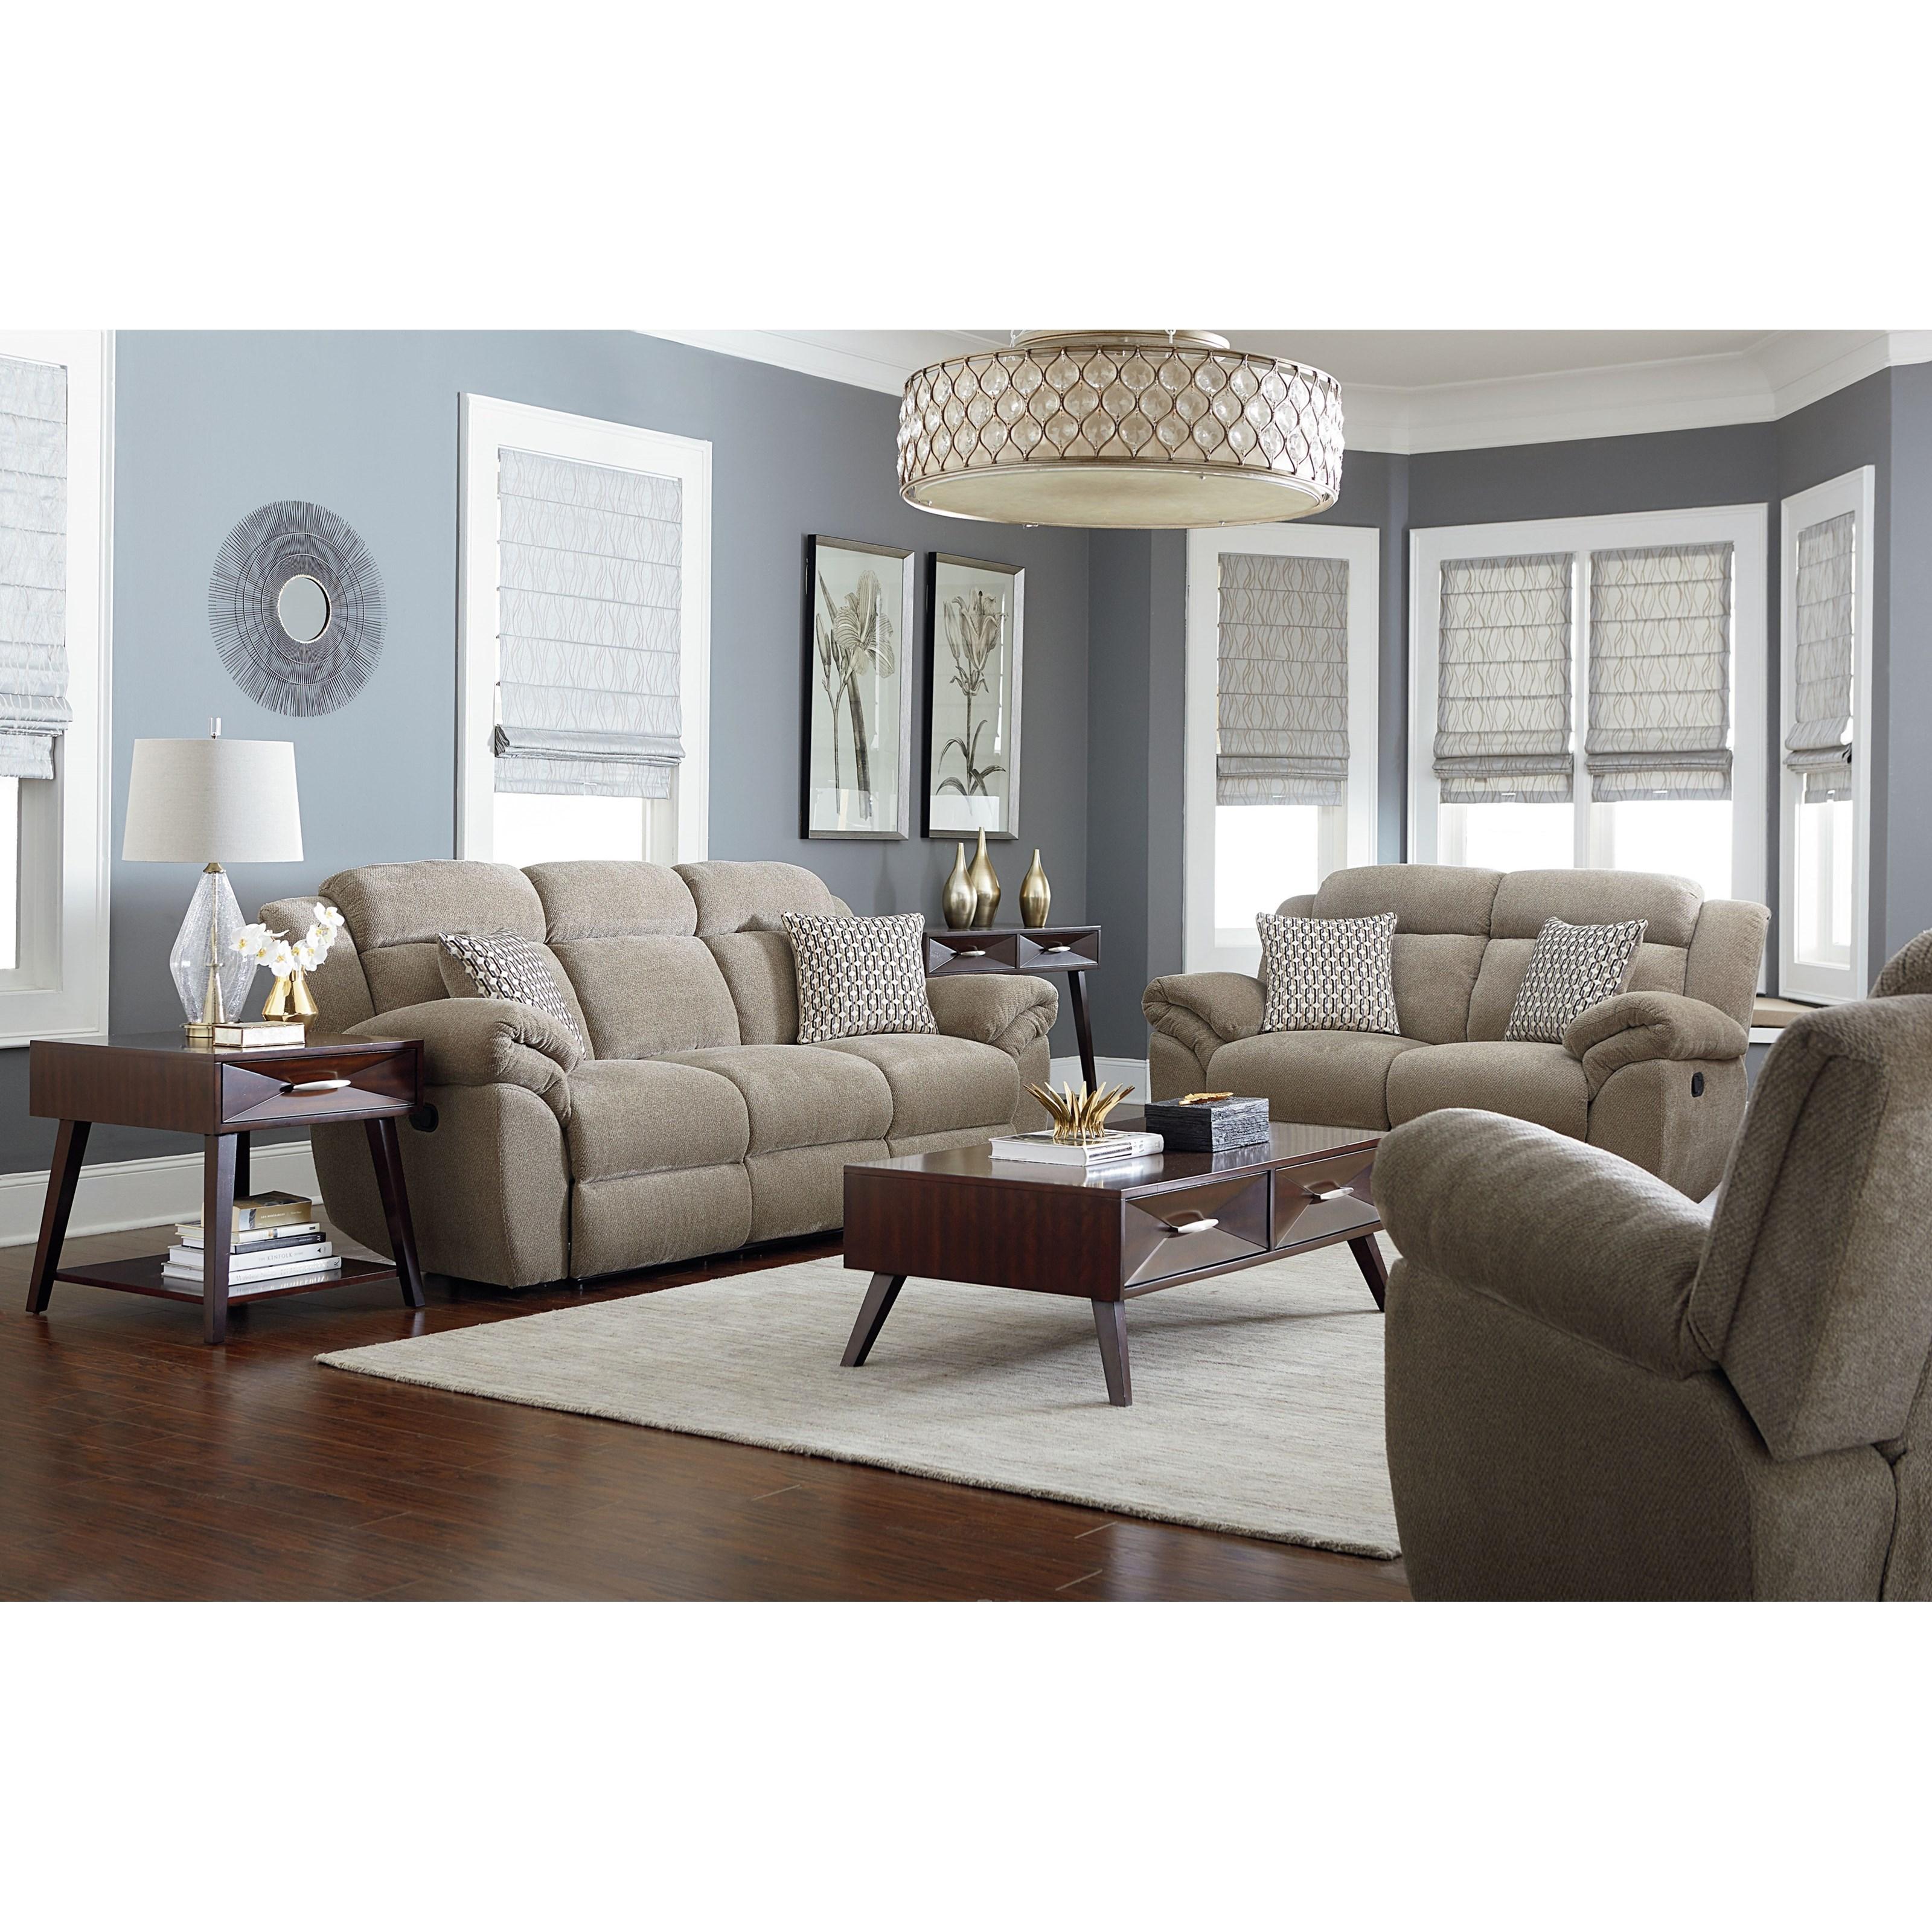 Standard Furniture Sweeney Casual Reclining Living Room